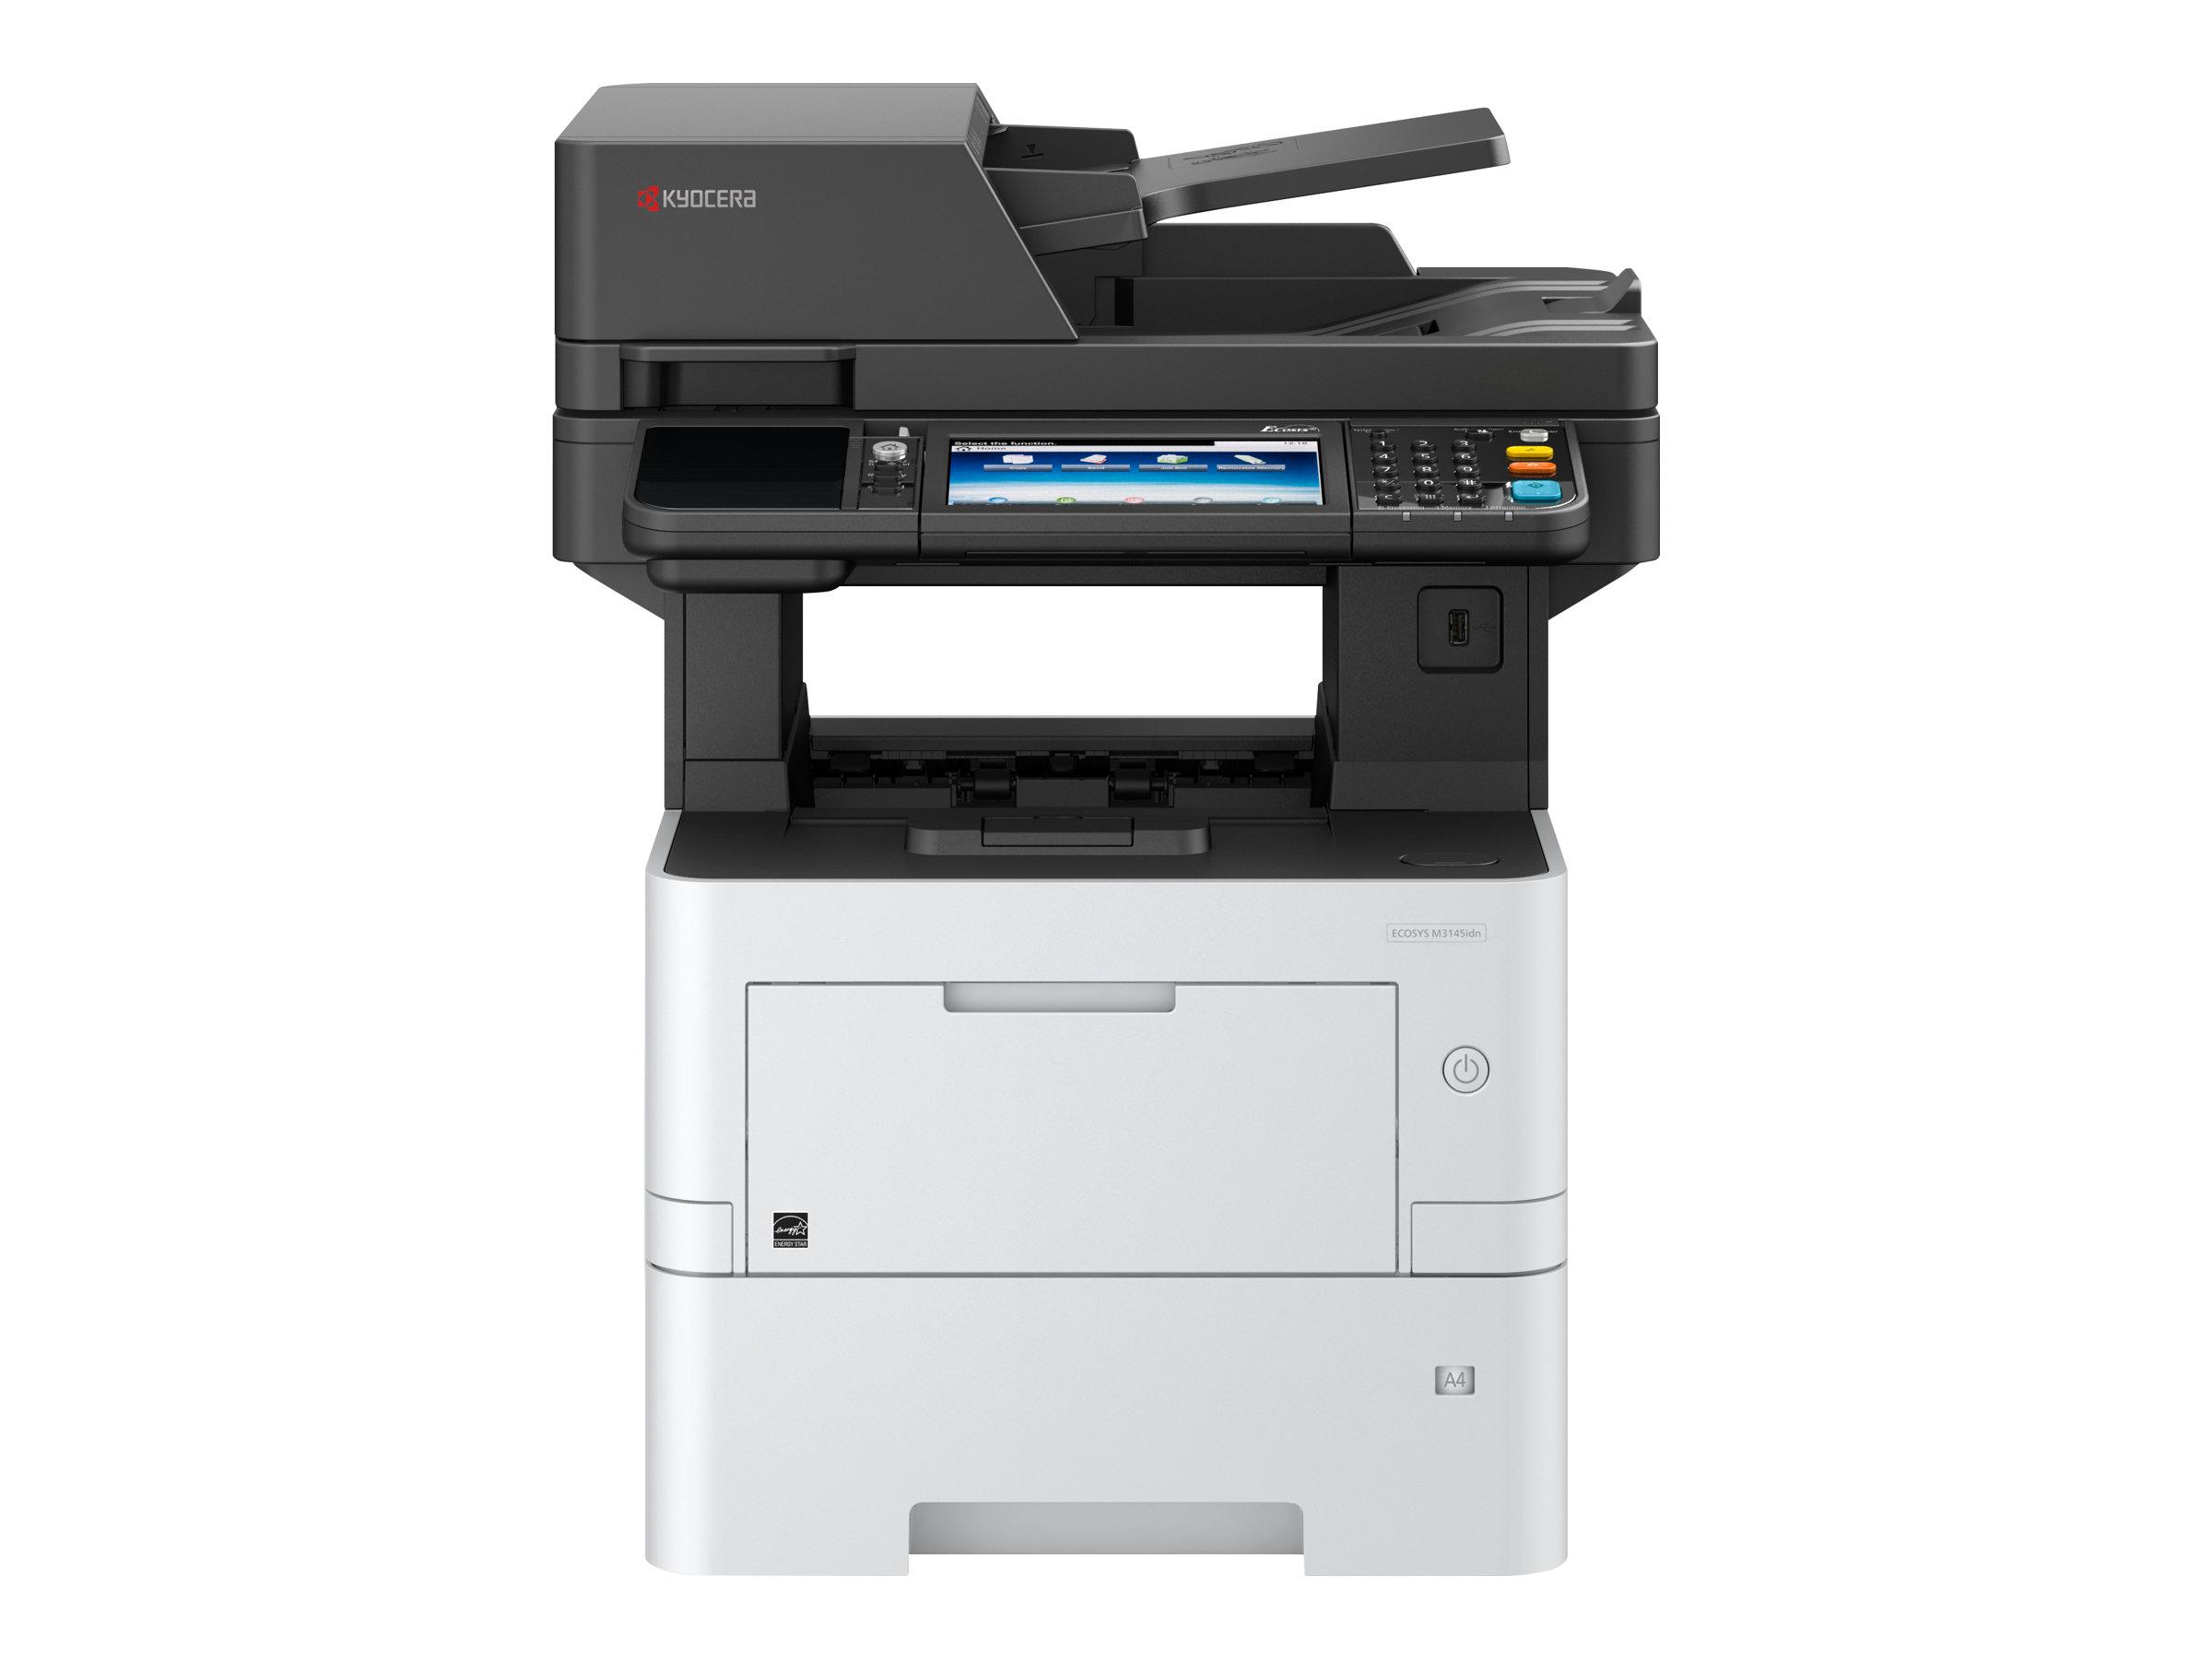 Kyocera ECOSYS M3145IDN - Multifunktionsdrucker - s/w - Laser - A4 (210 x 297 mm)